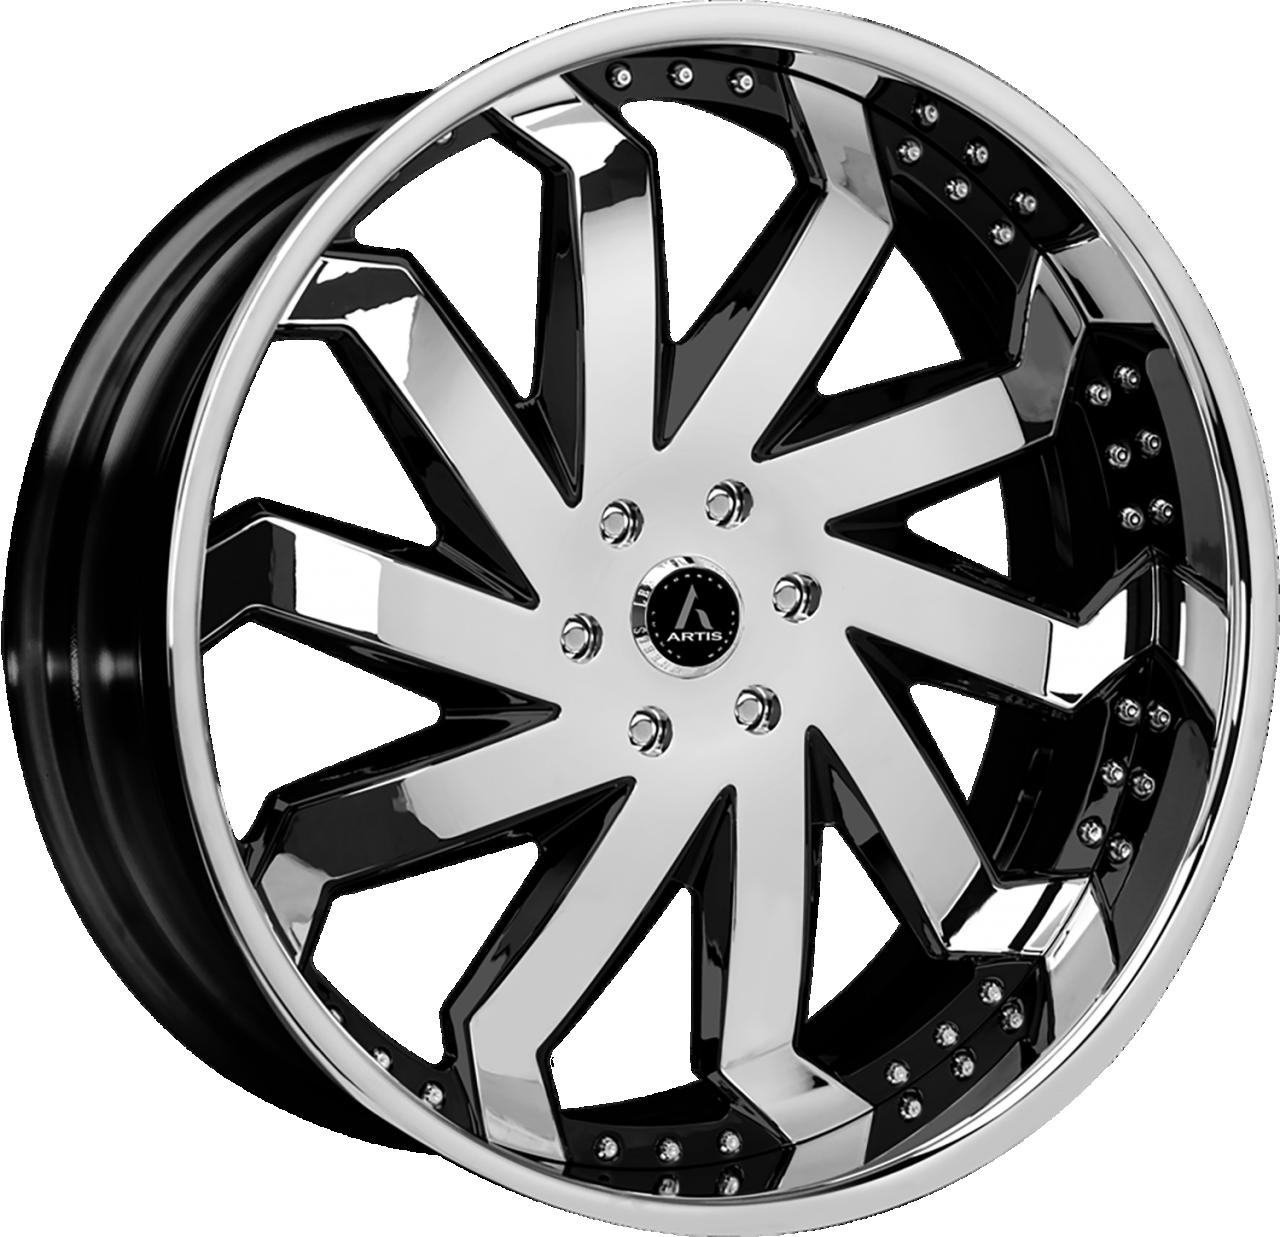 Artis Forged Rain wheel with Custom Chrome and Black finish